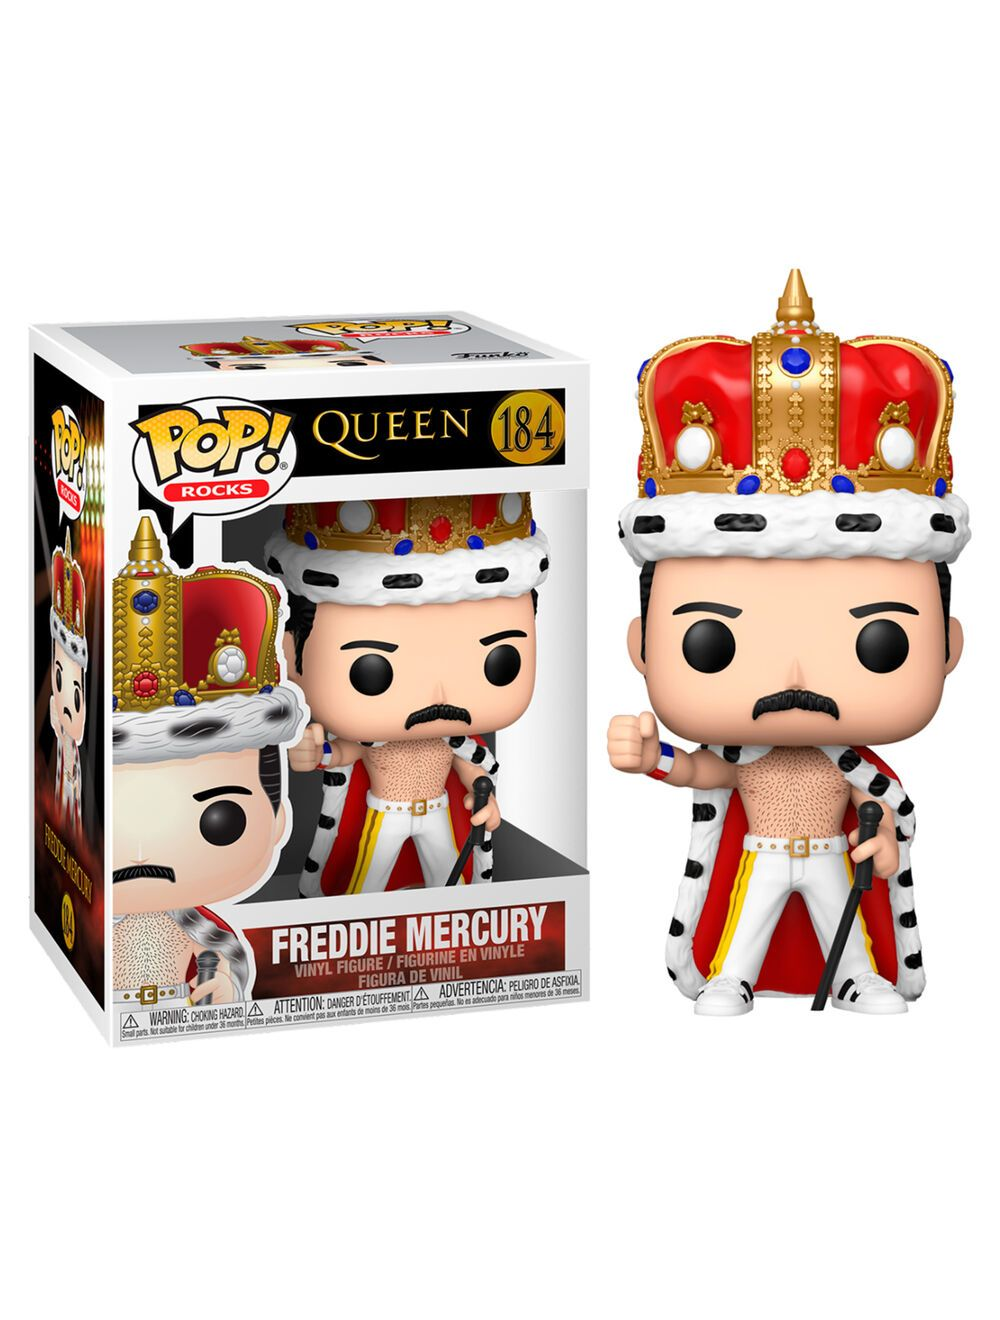 Funko POP! Queen - Freddie Mercury King Vinyl figura 10cm